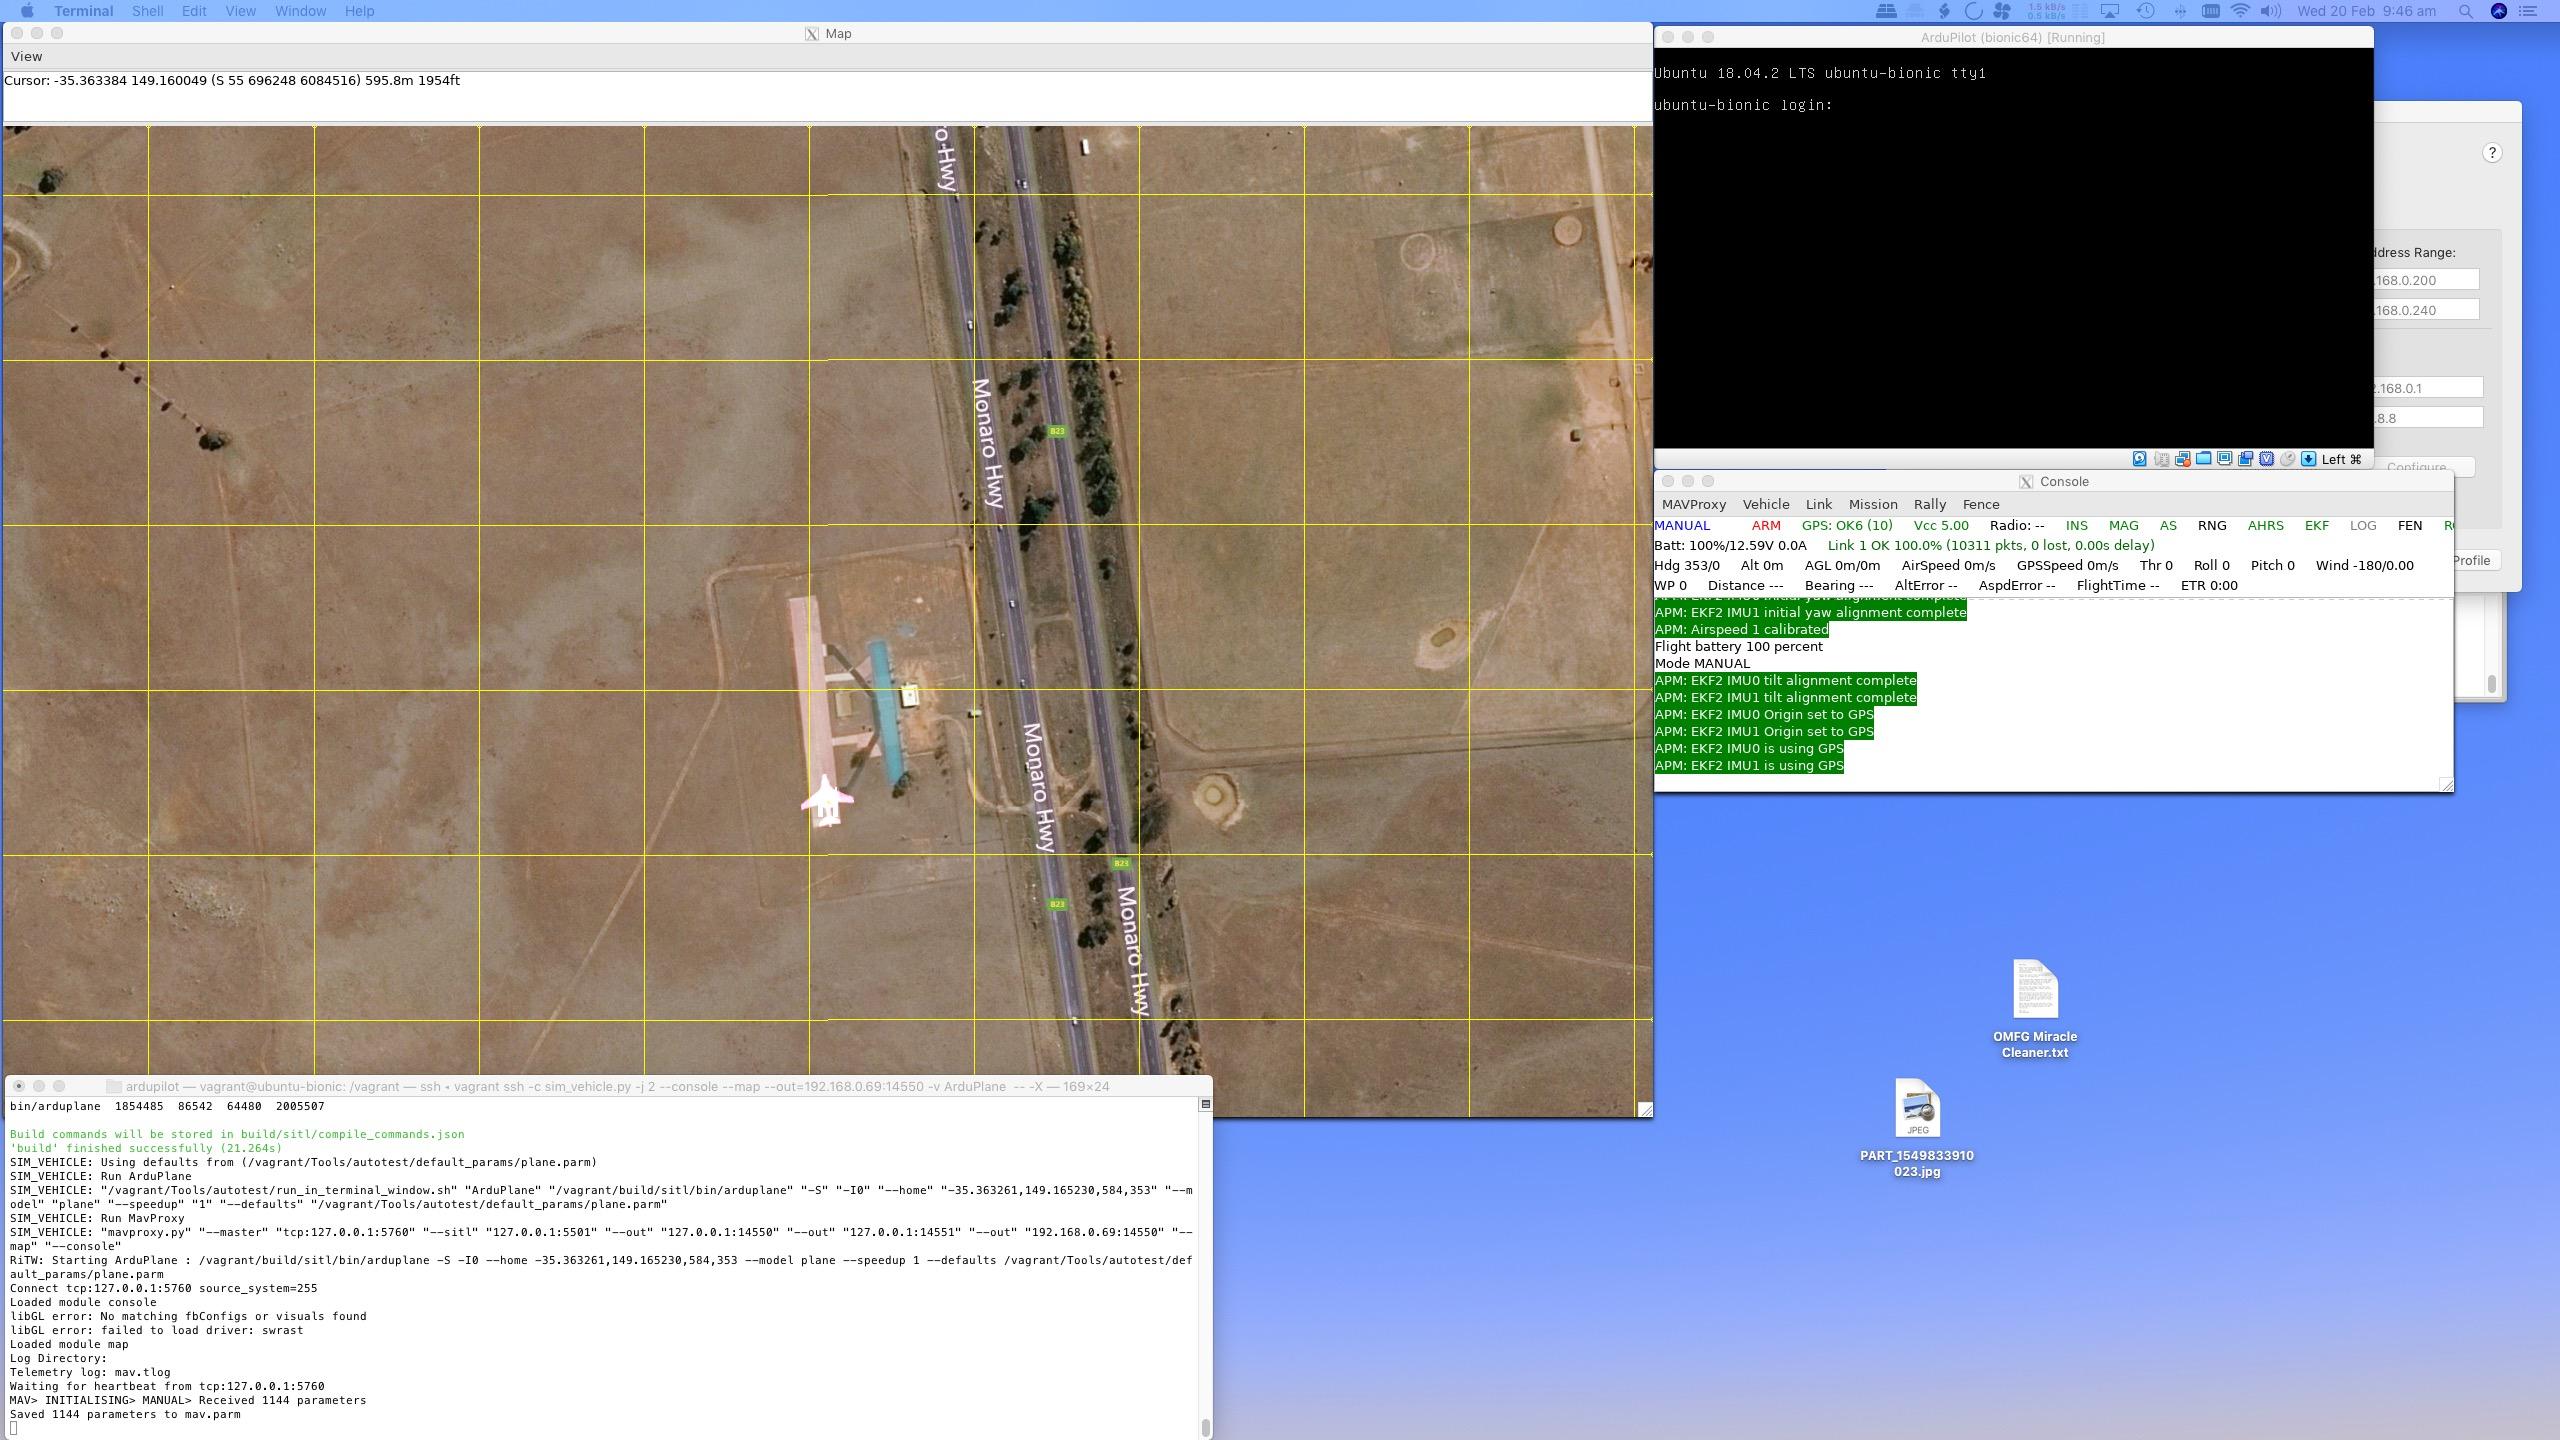 Tutorial for running SITL Simulator on MacOS with Vagrant + XQuartz